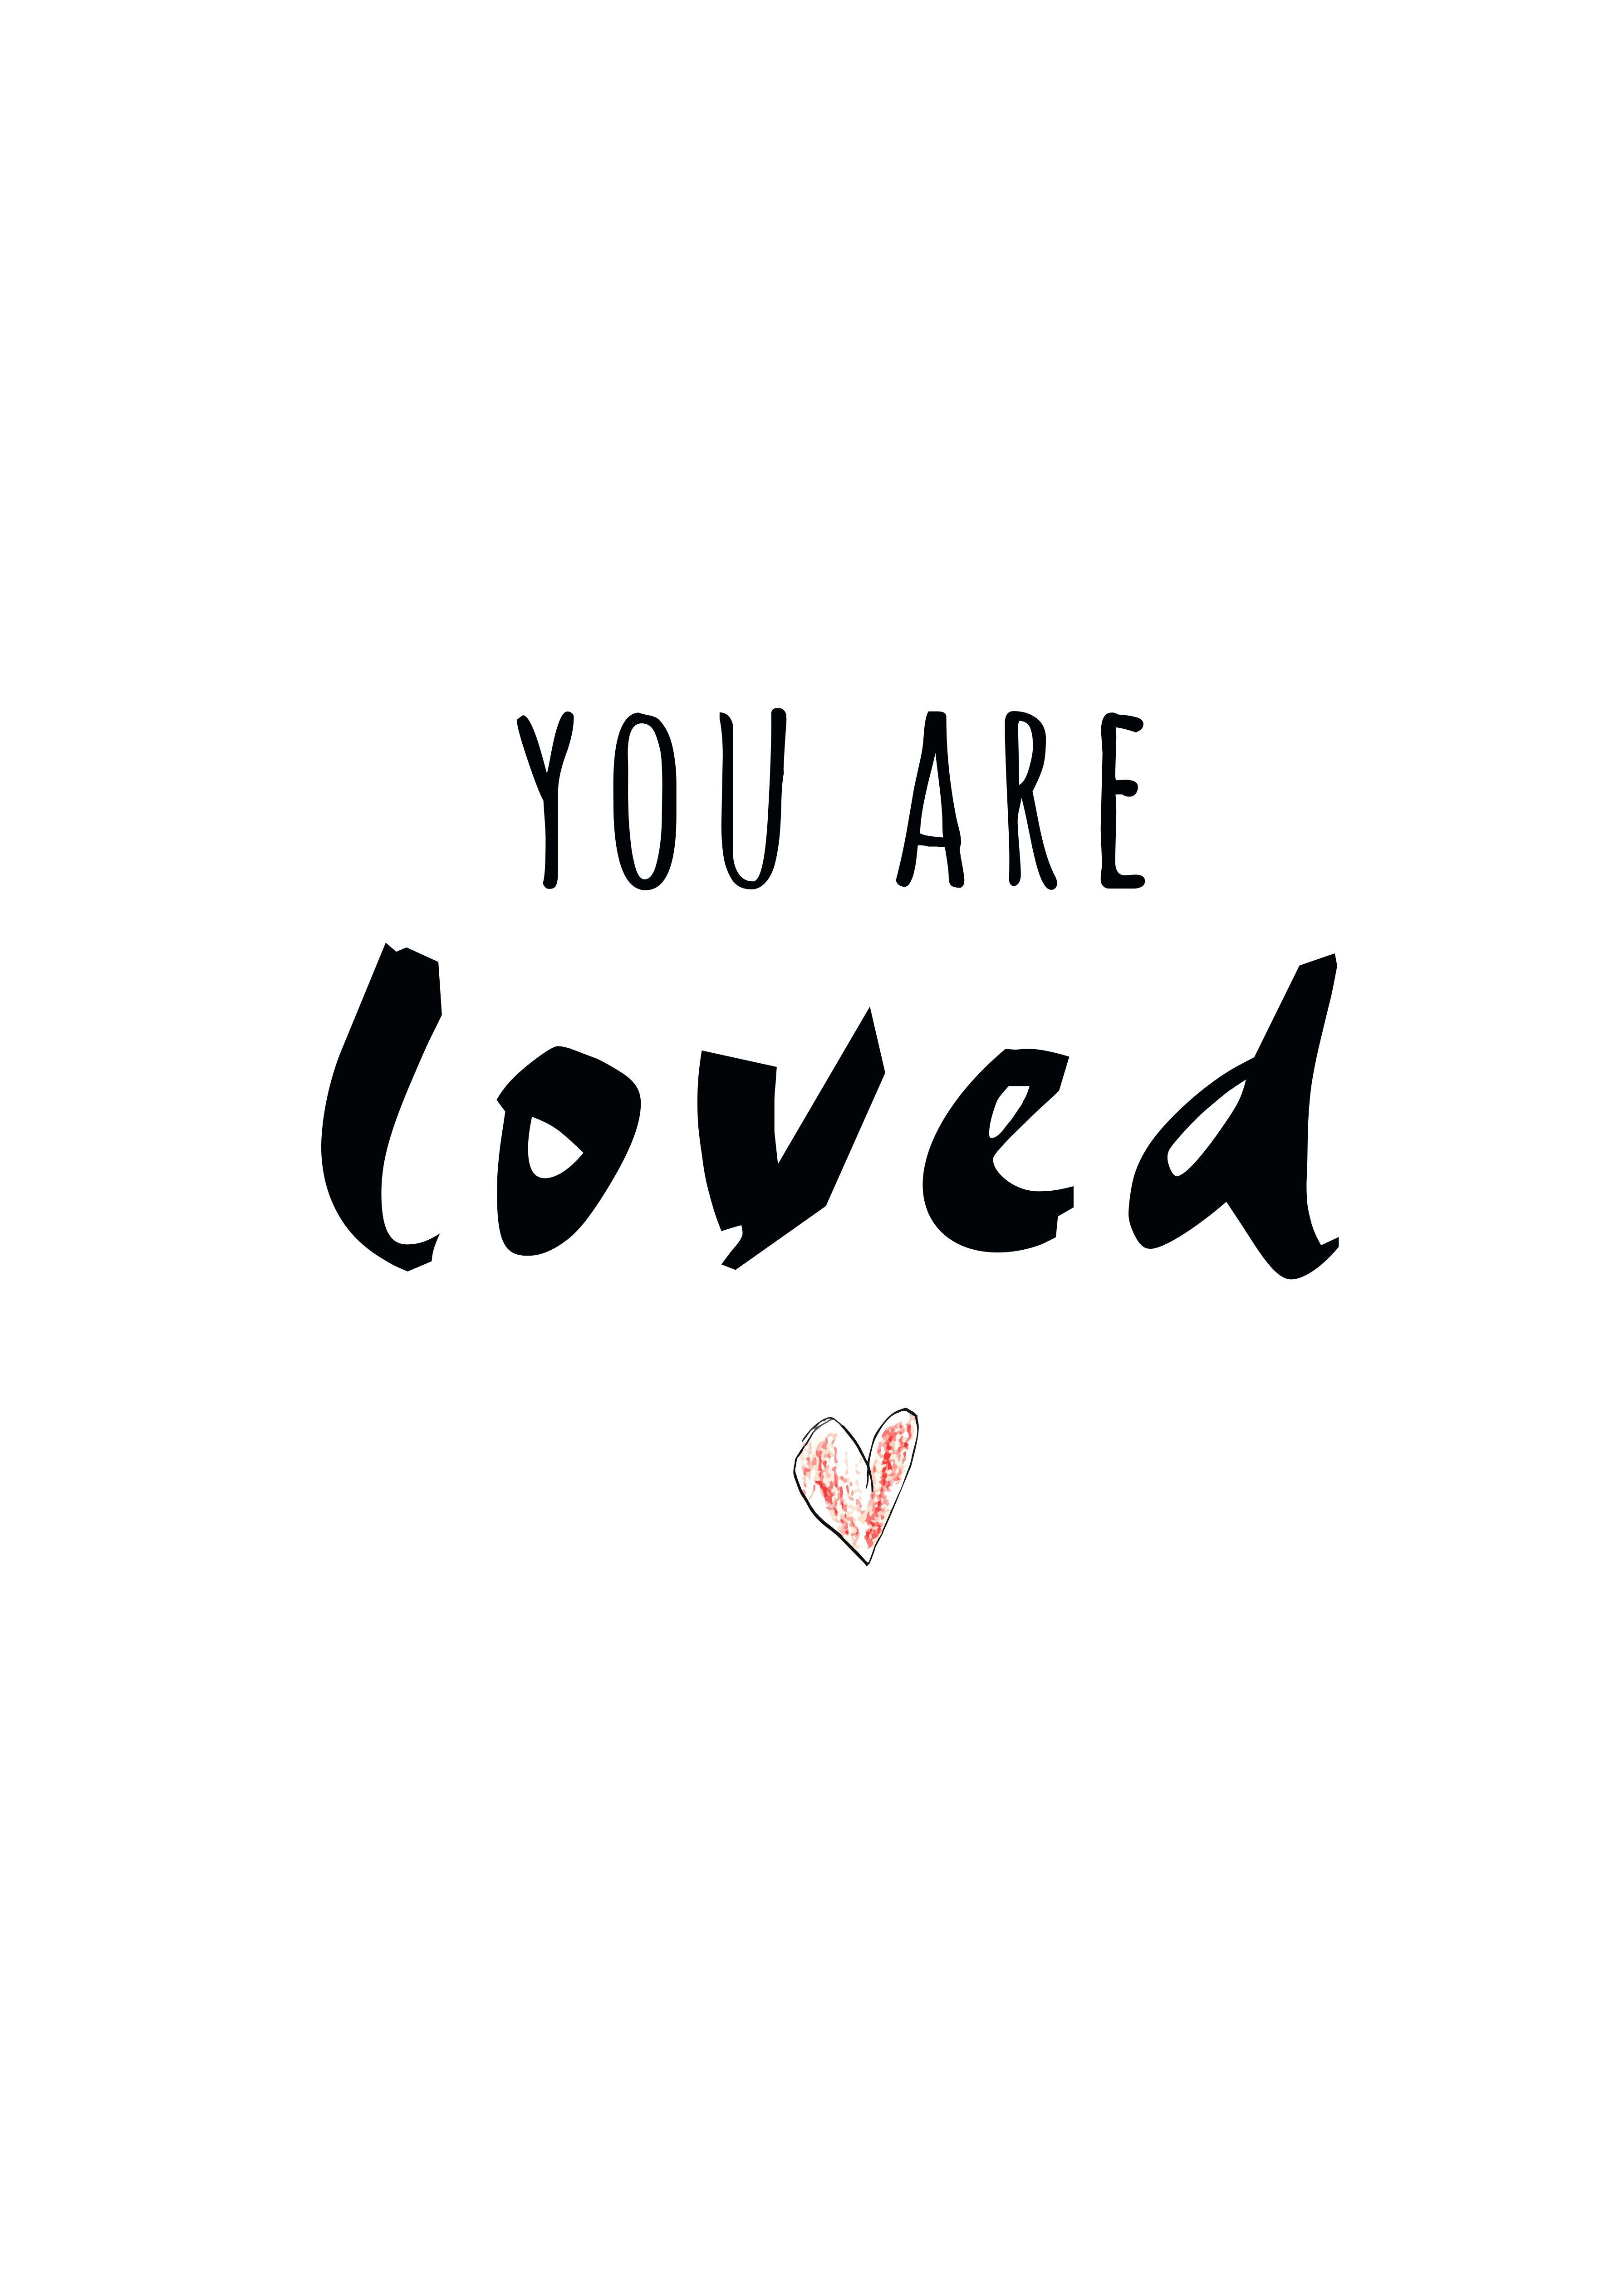 You are loved | w a l l p a p e r s | Tumblr sprüche ...